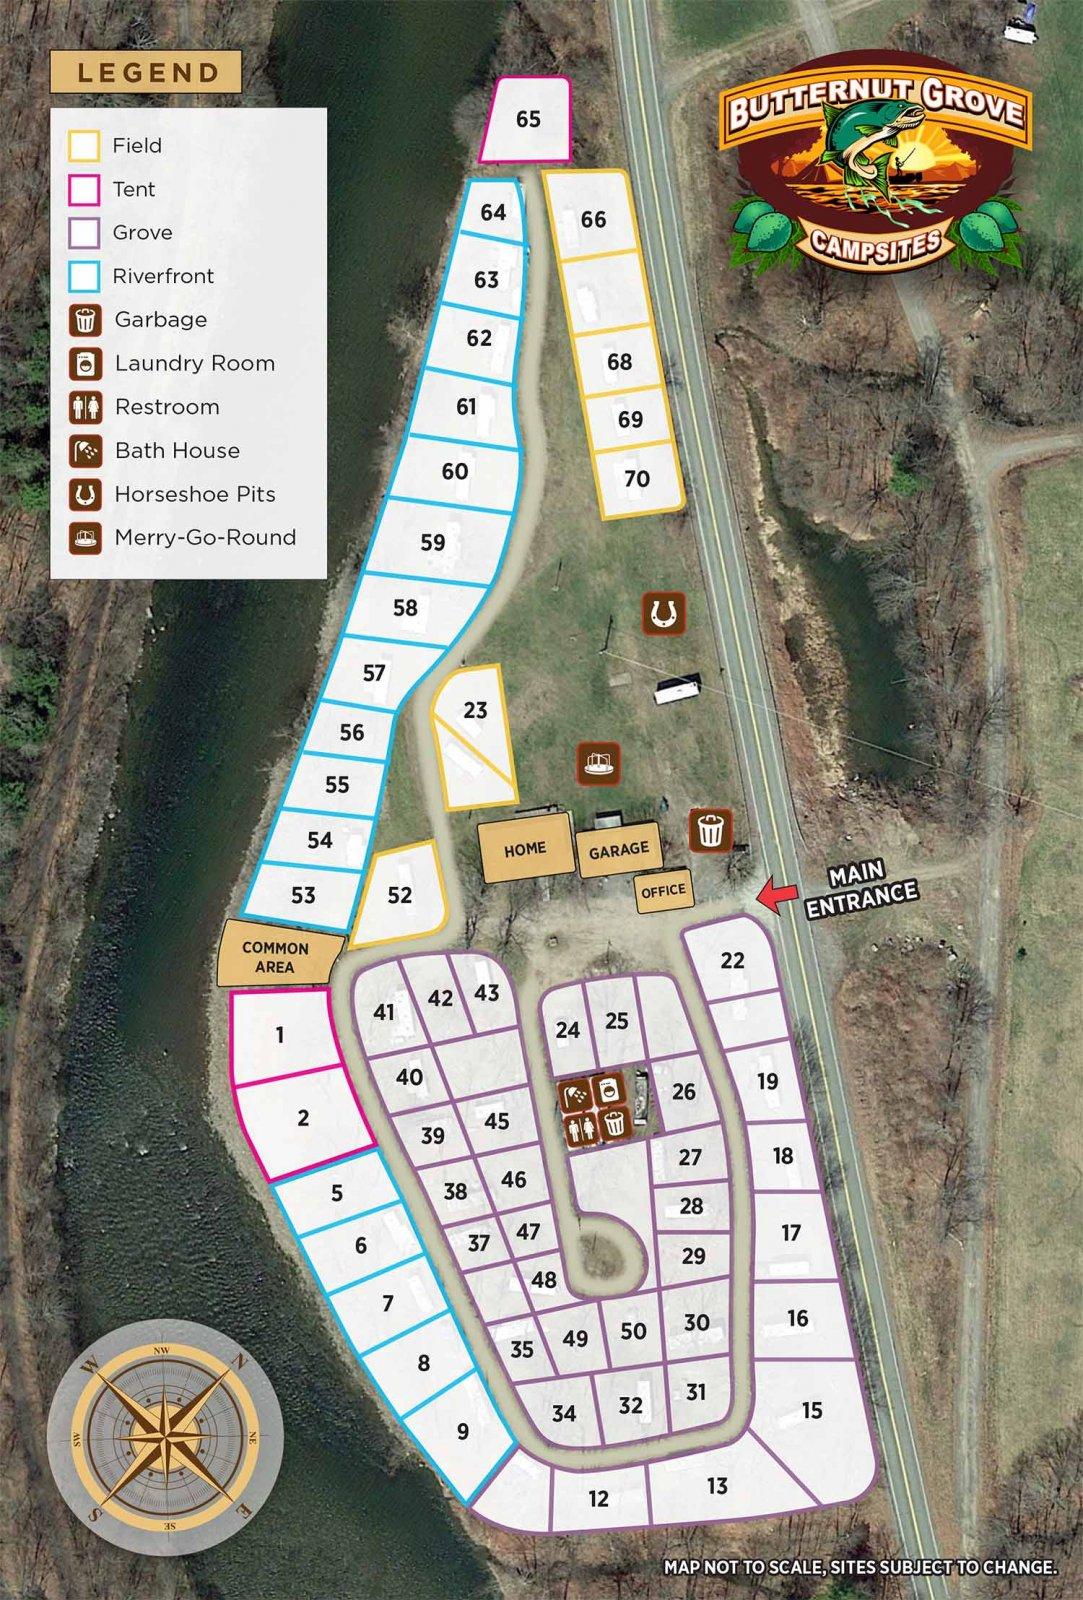 Butternut Grove Campsites RV Park Map